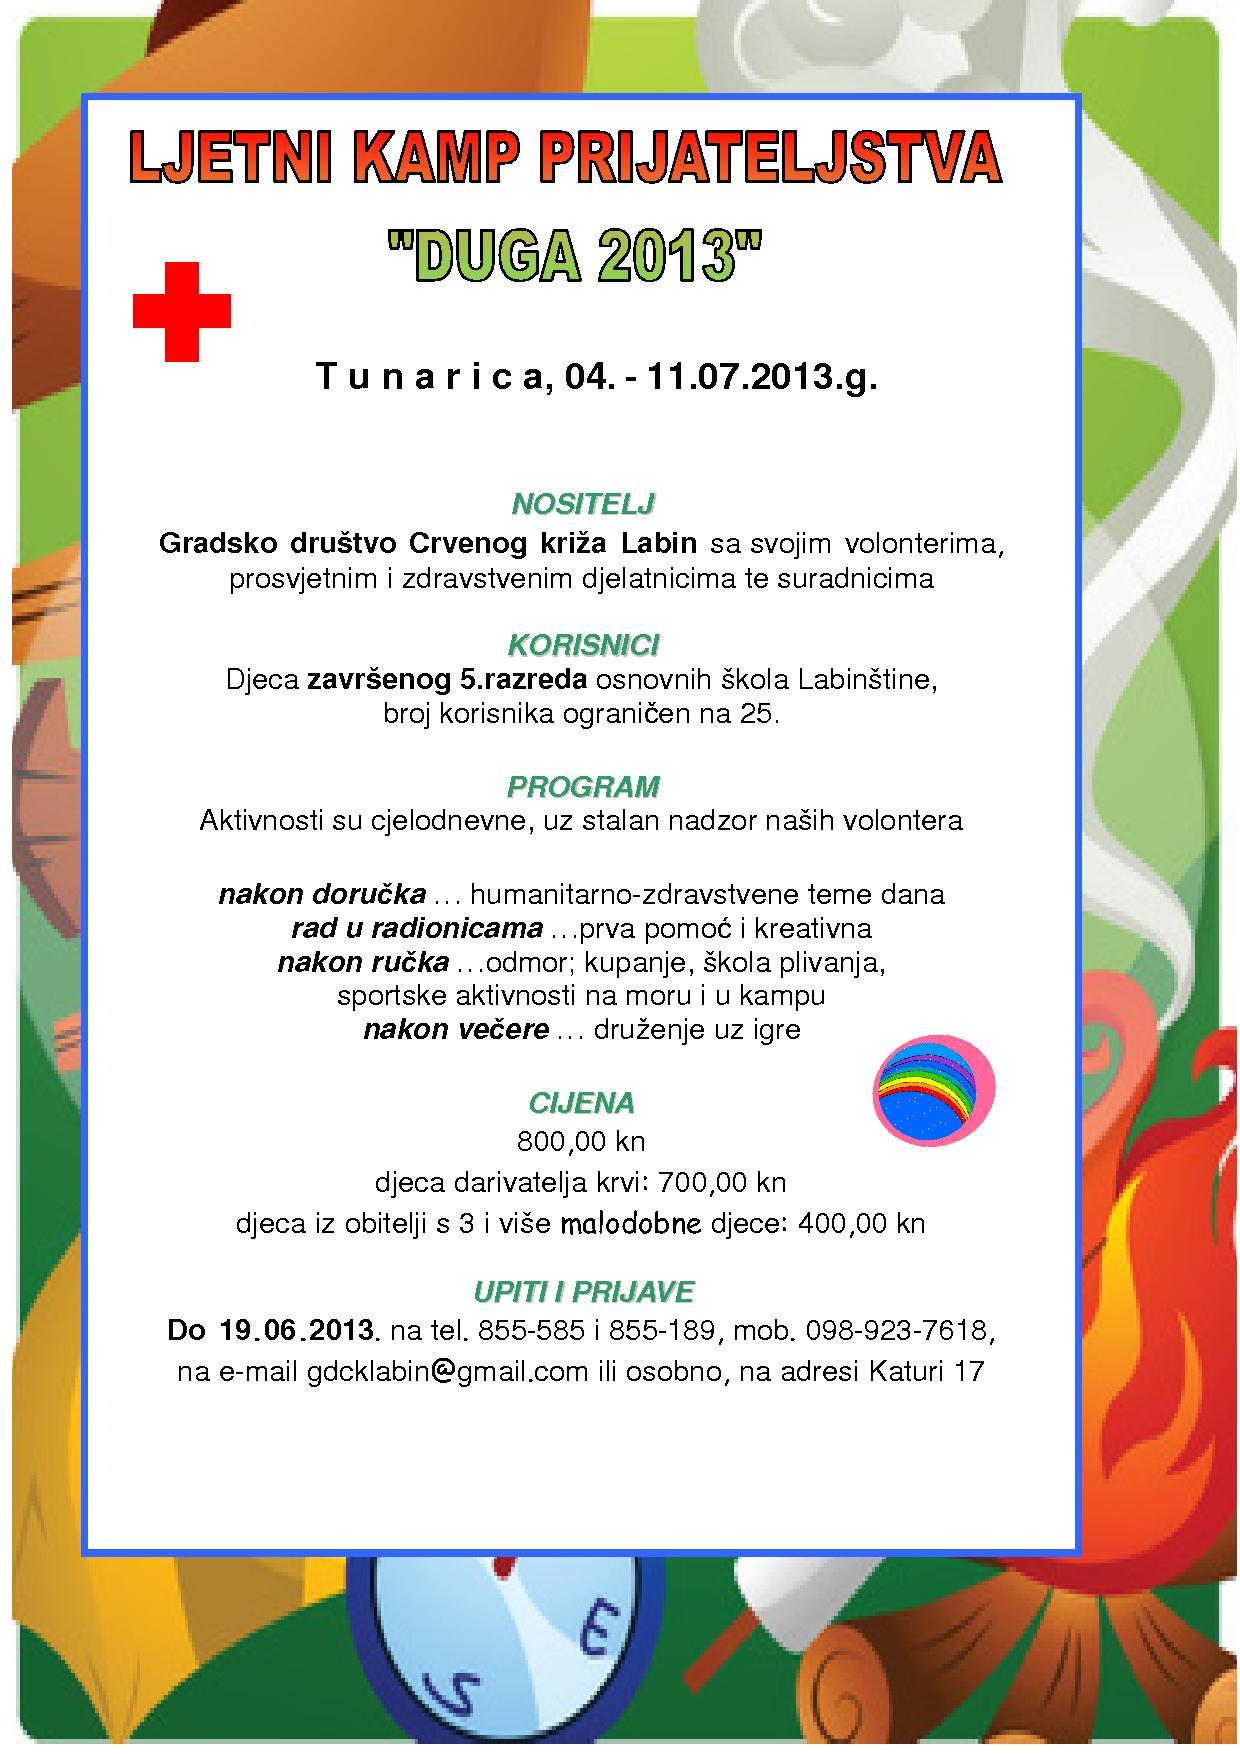 info-duga-13-a4